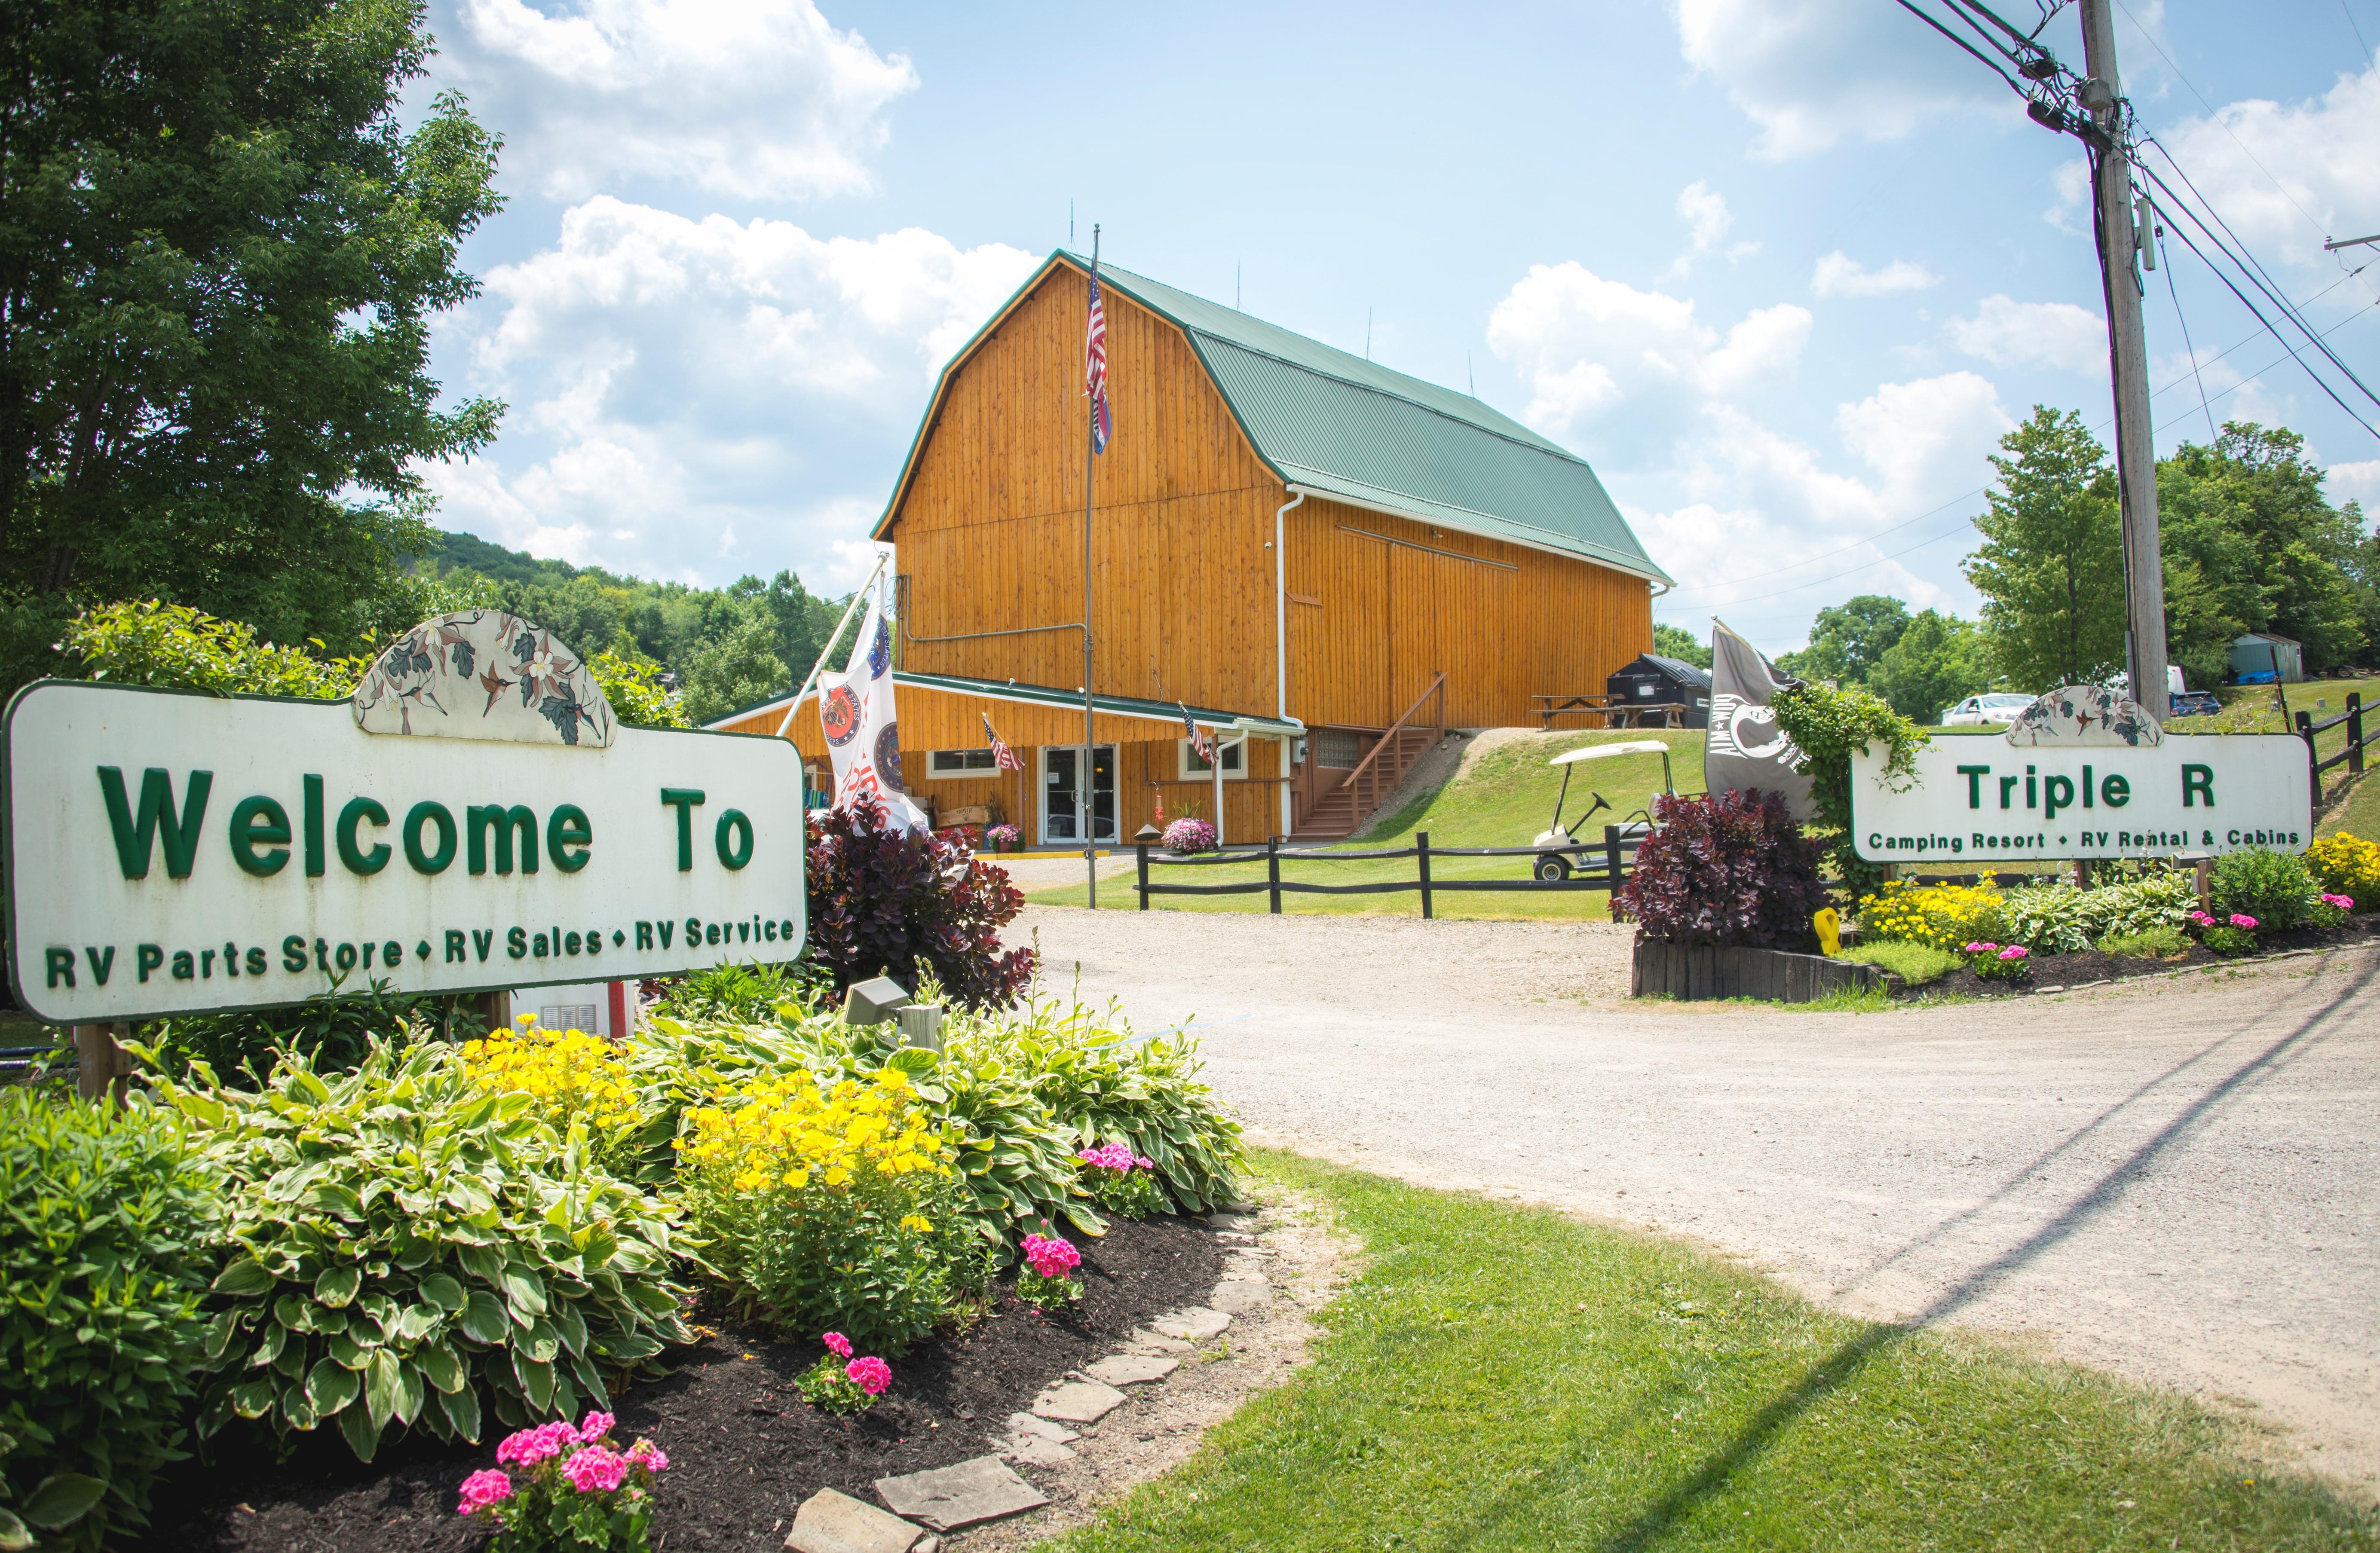 Triple R Camping Resort Amp Trailer Sales In Franklinville